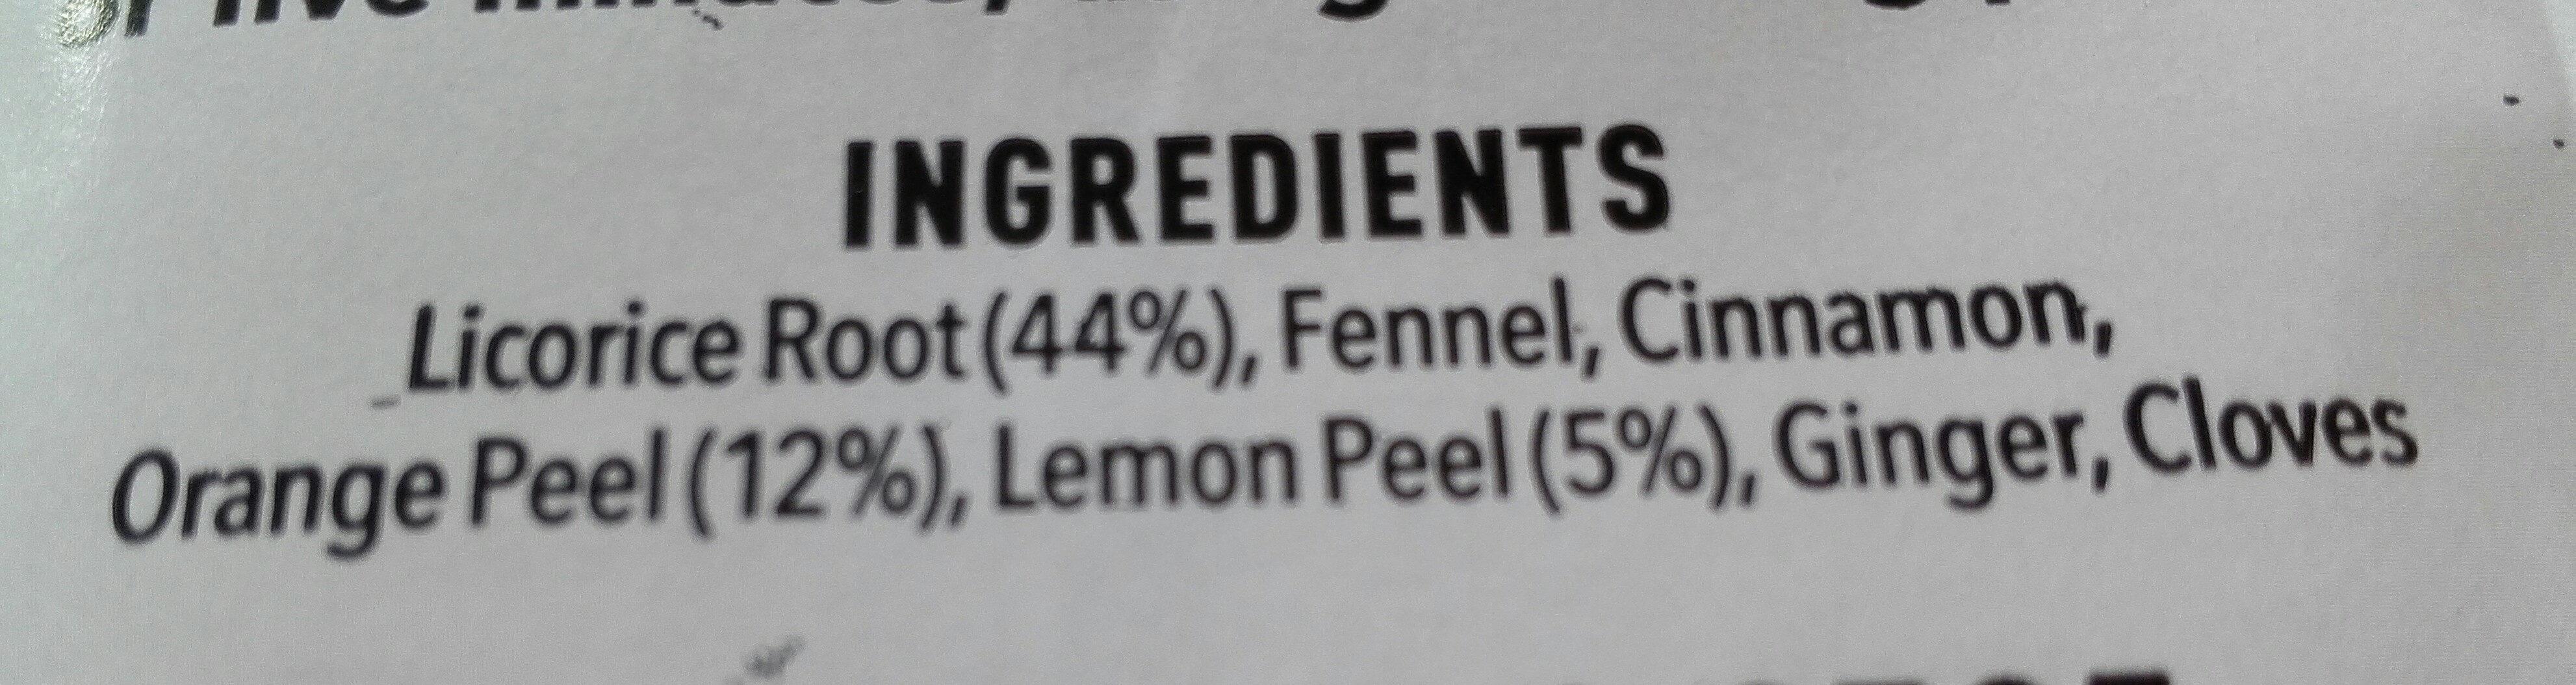 licorice - Ingredients - en